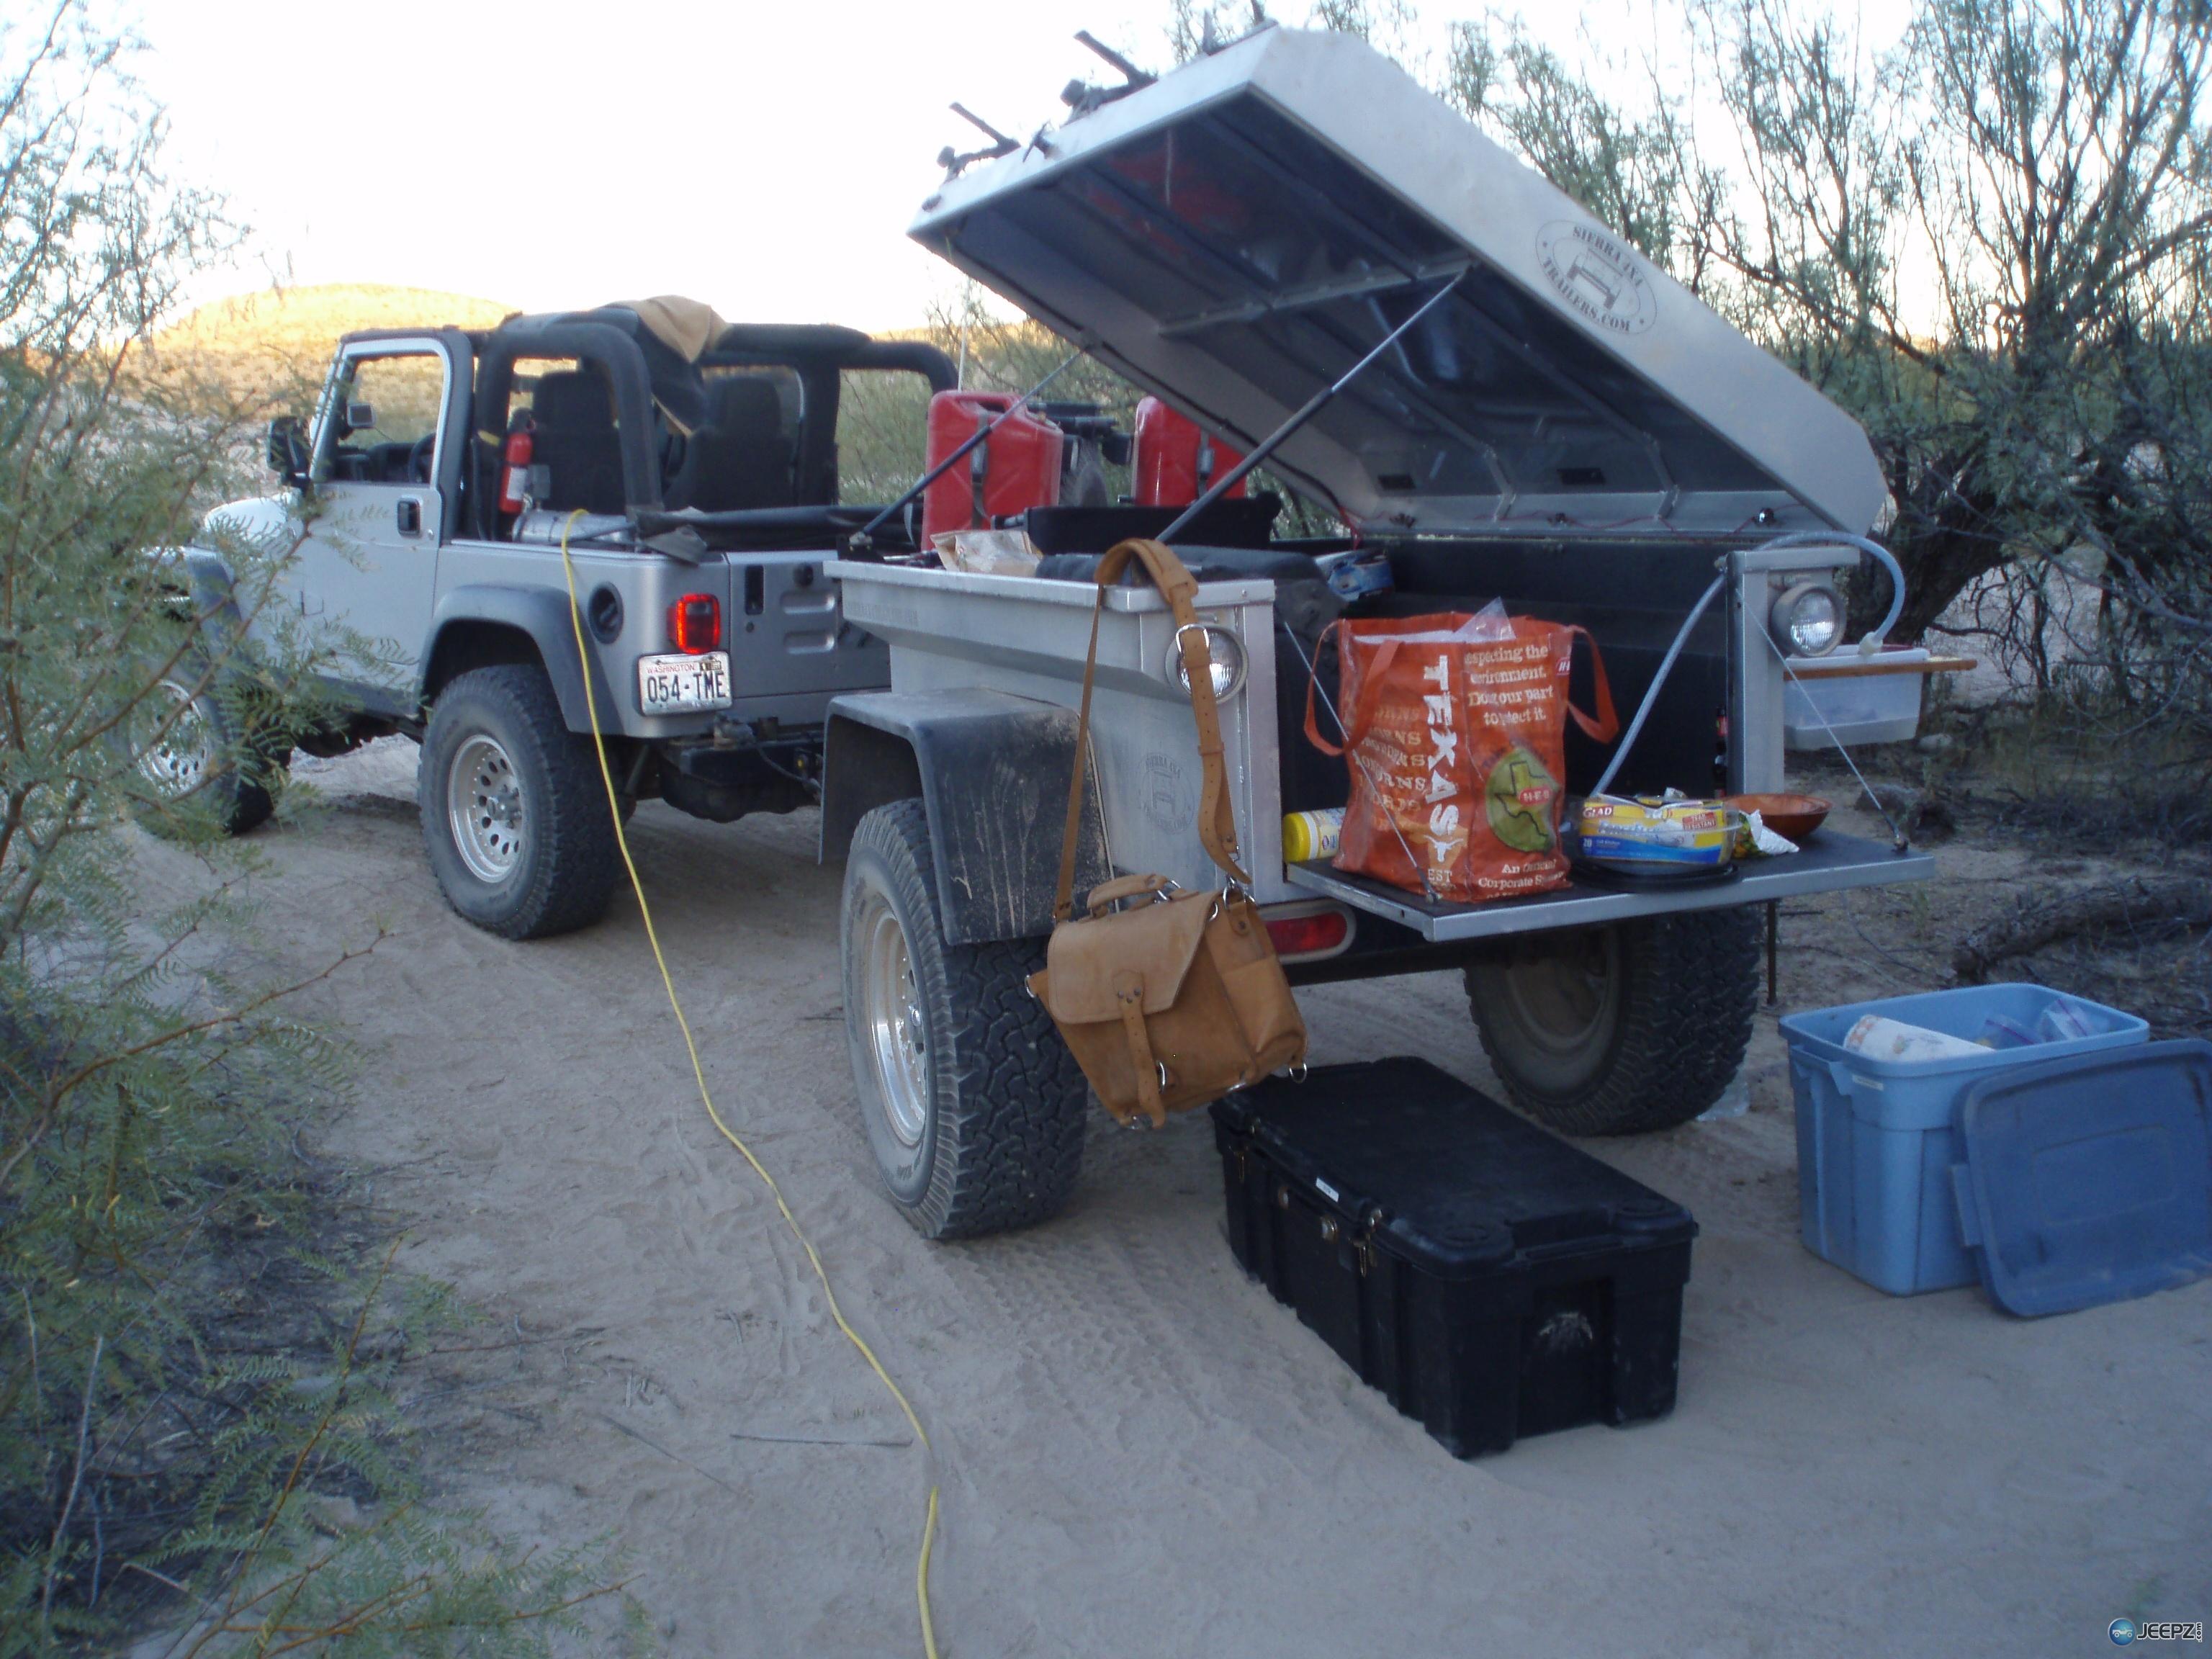 Trailer Or Roof Rack 226